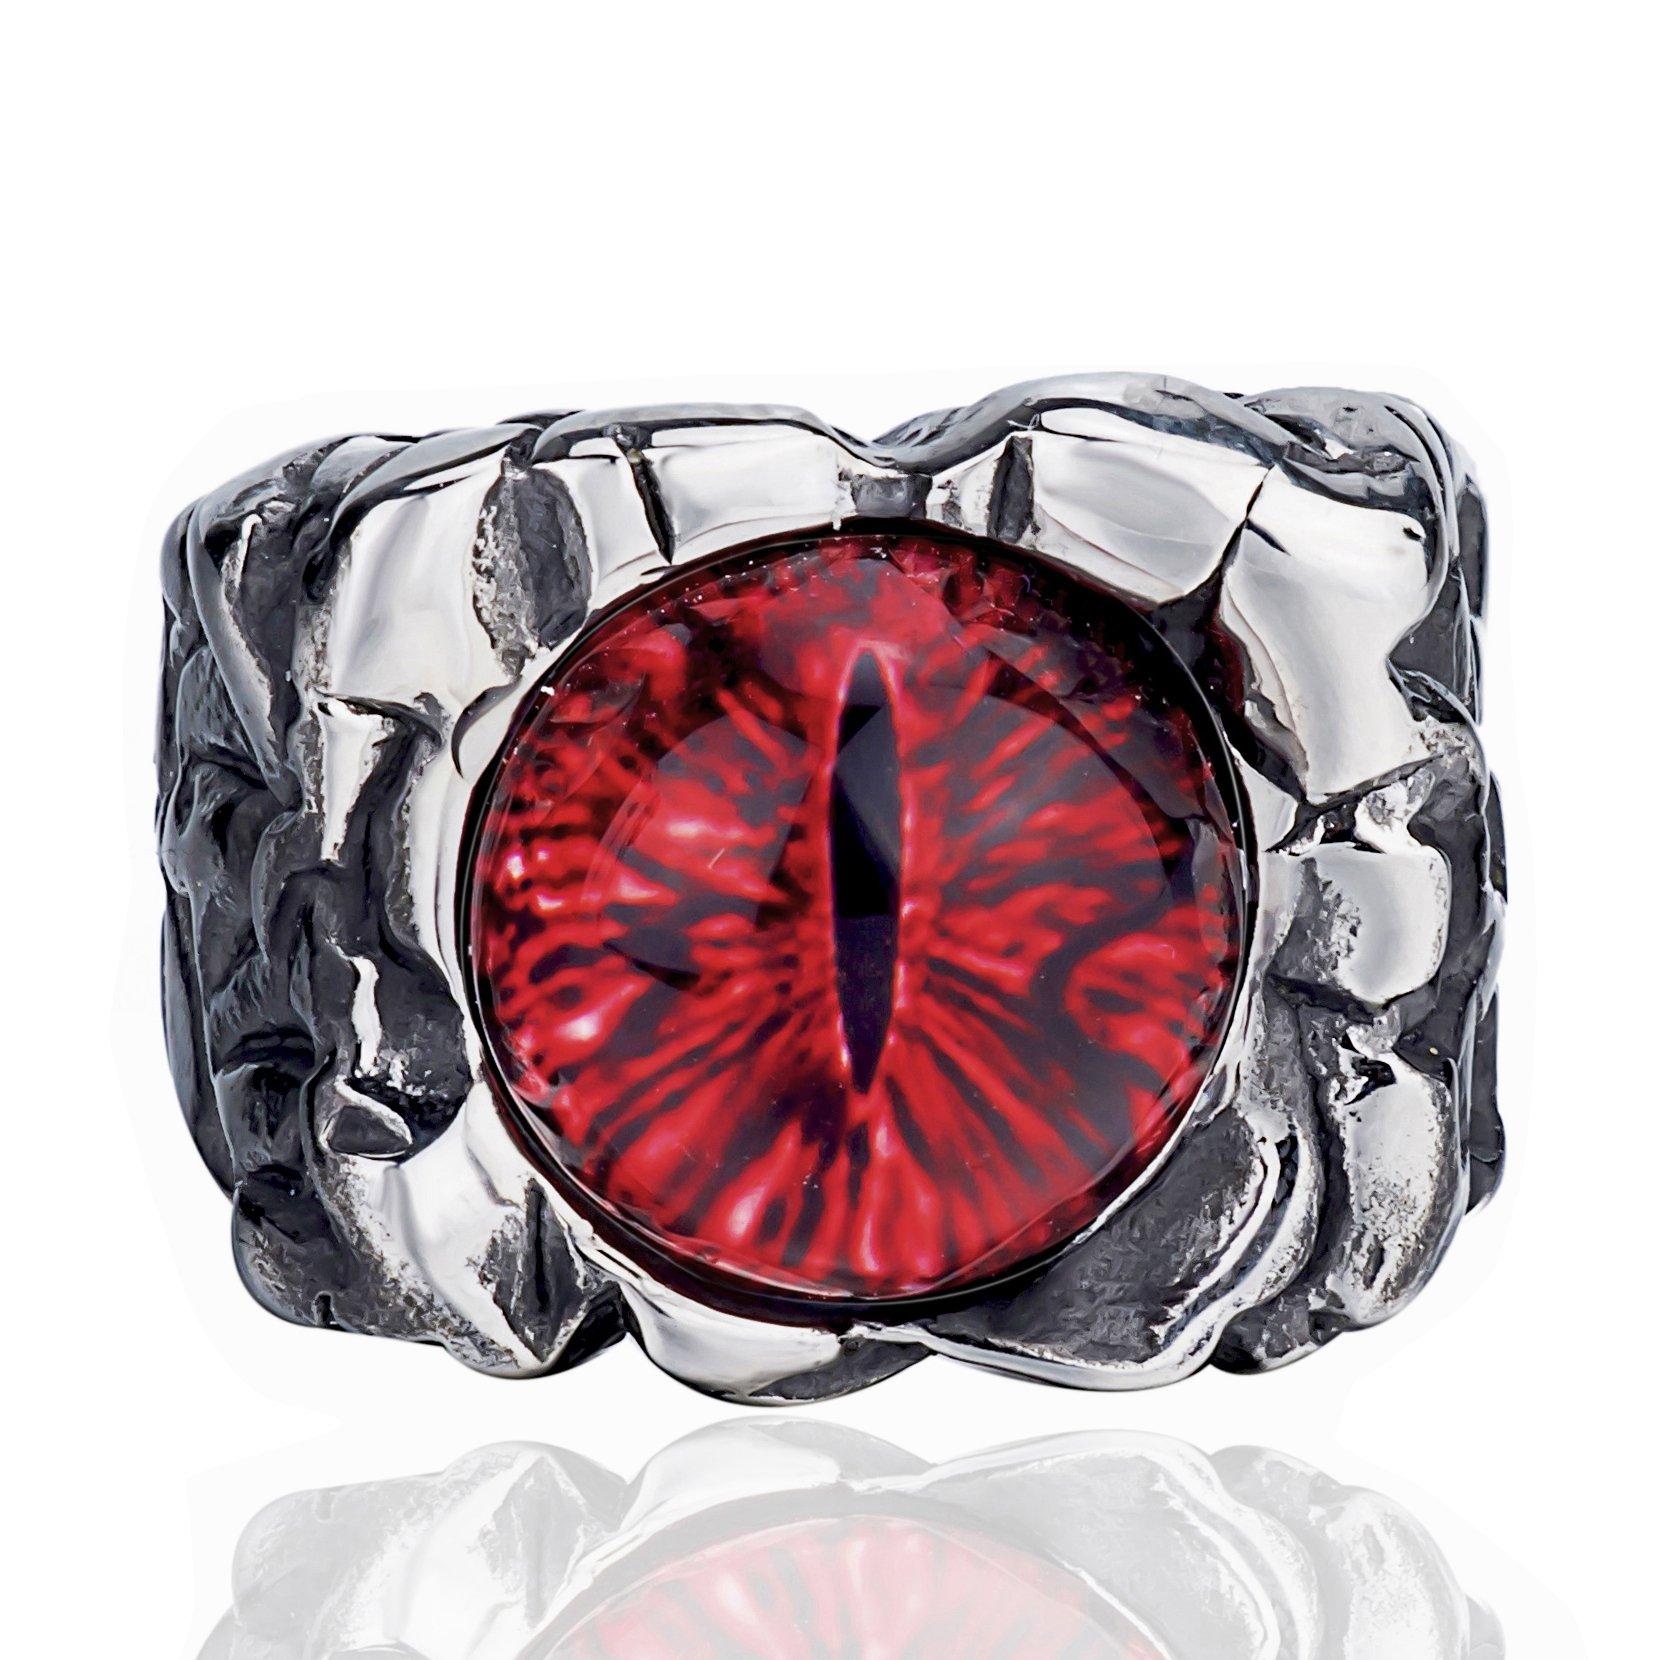 Men's Hellfire The Devil's eye Red Stainless Steel Ring Biker Jewelry Size 9